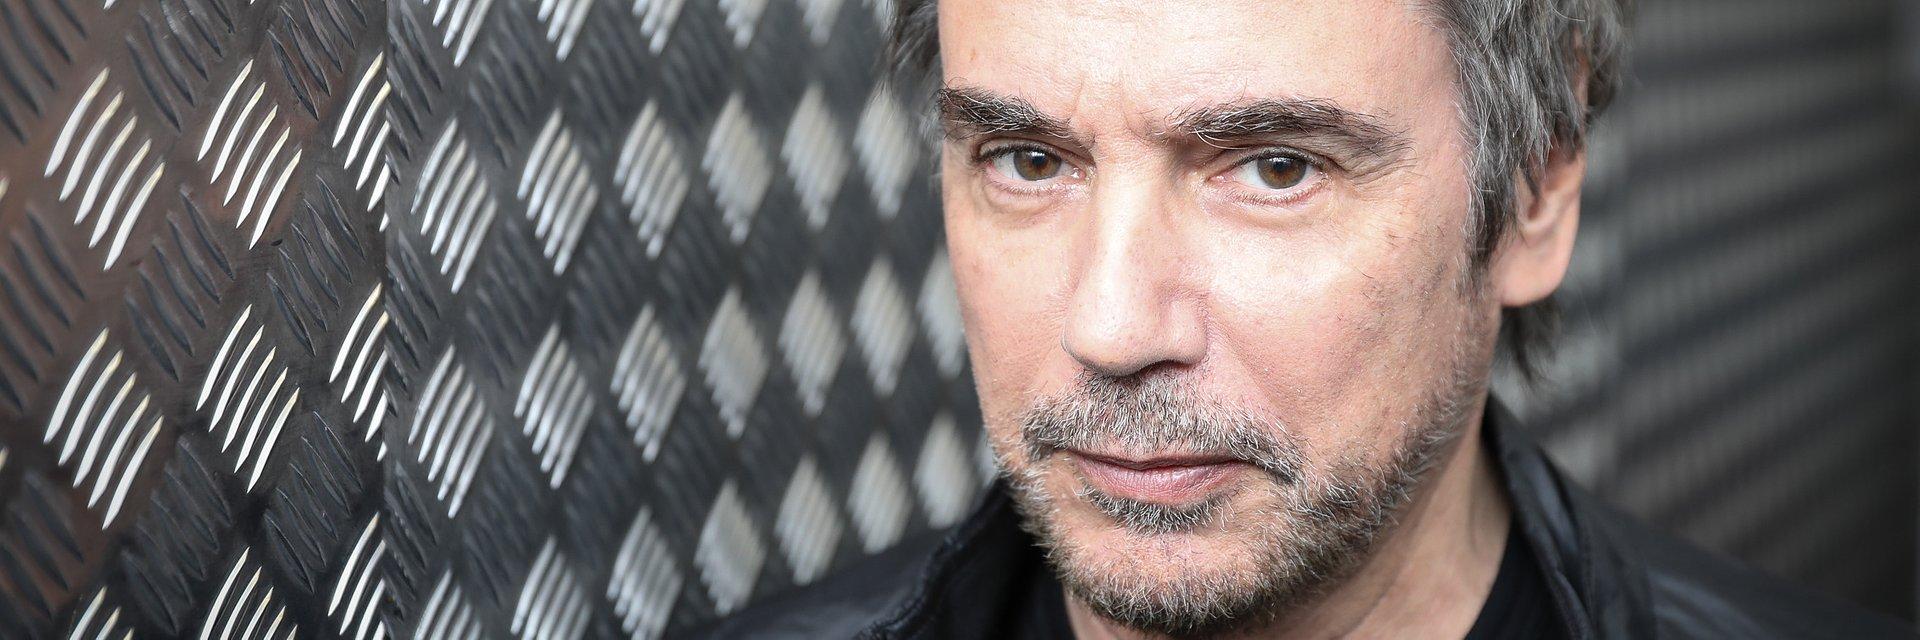 Jean-Michel Jarre zapowiada spektakularny koncert sylwestrowy